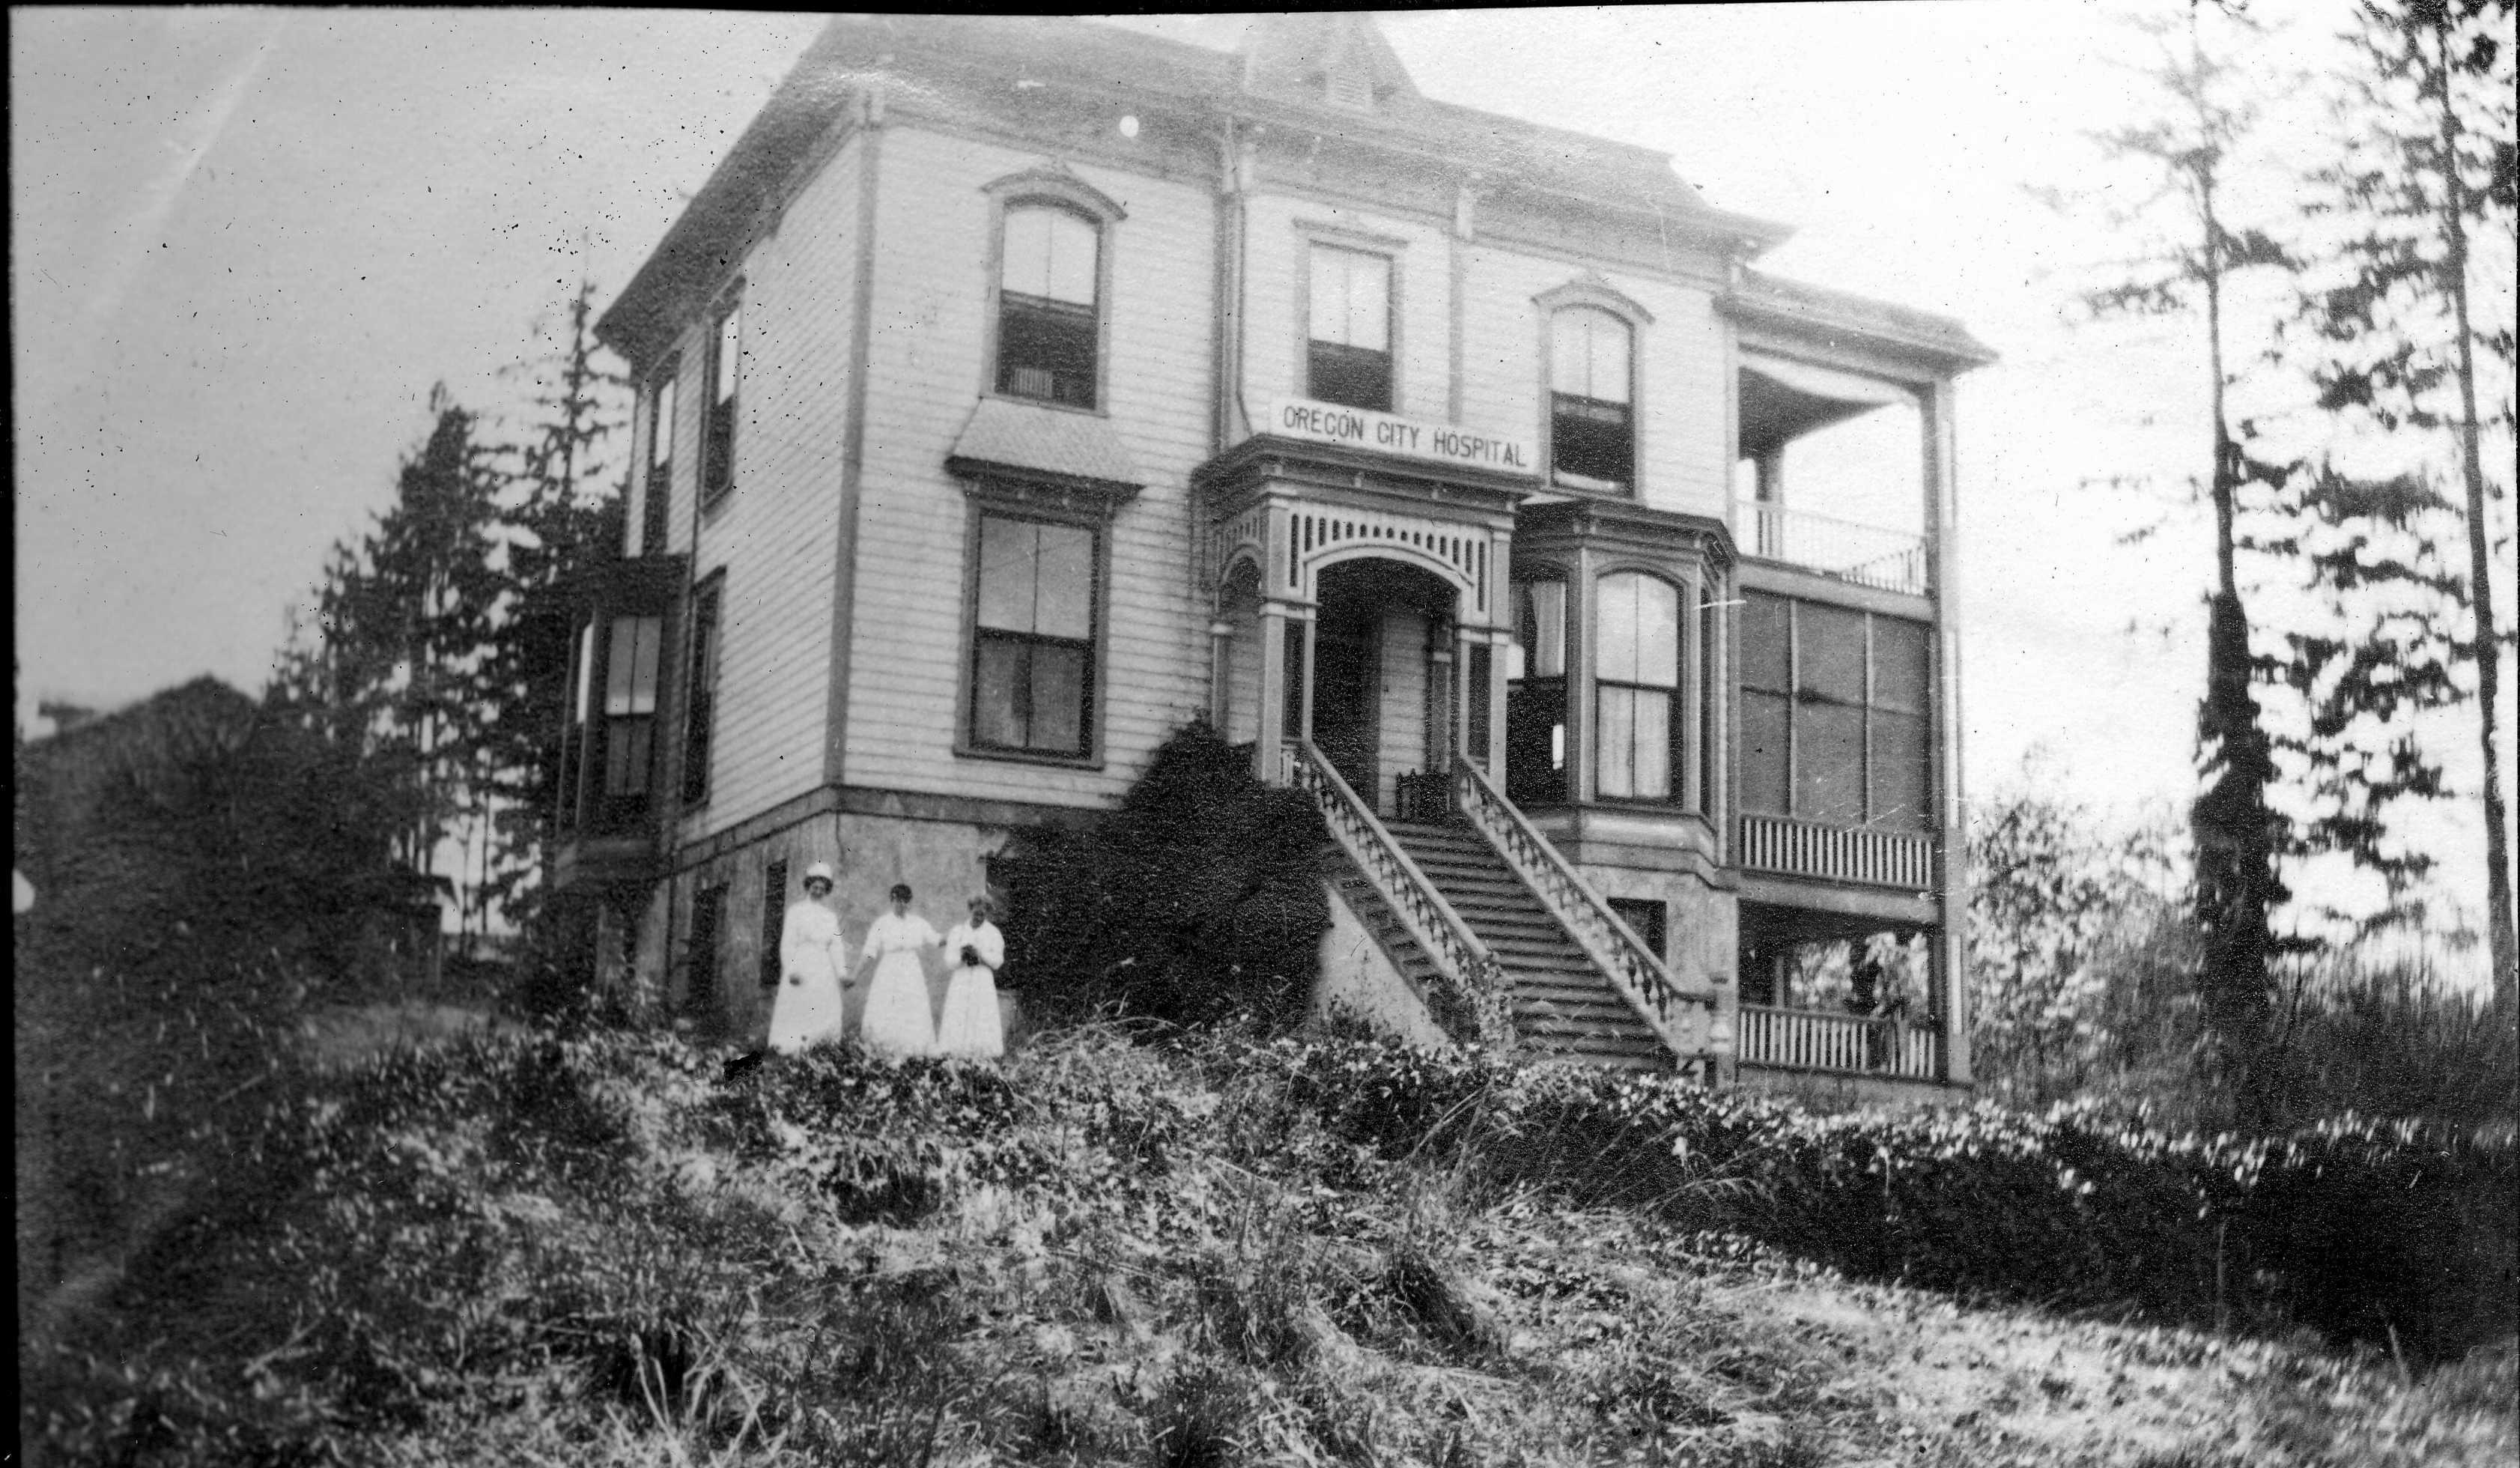 Oregon City Hospital